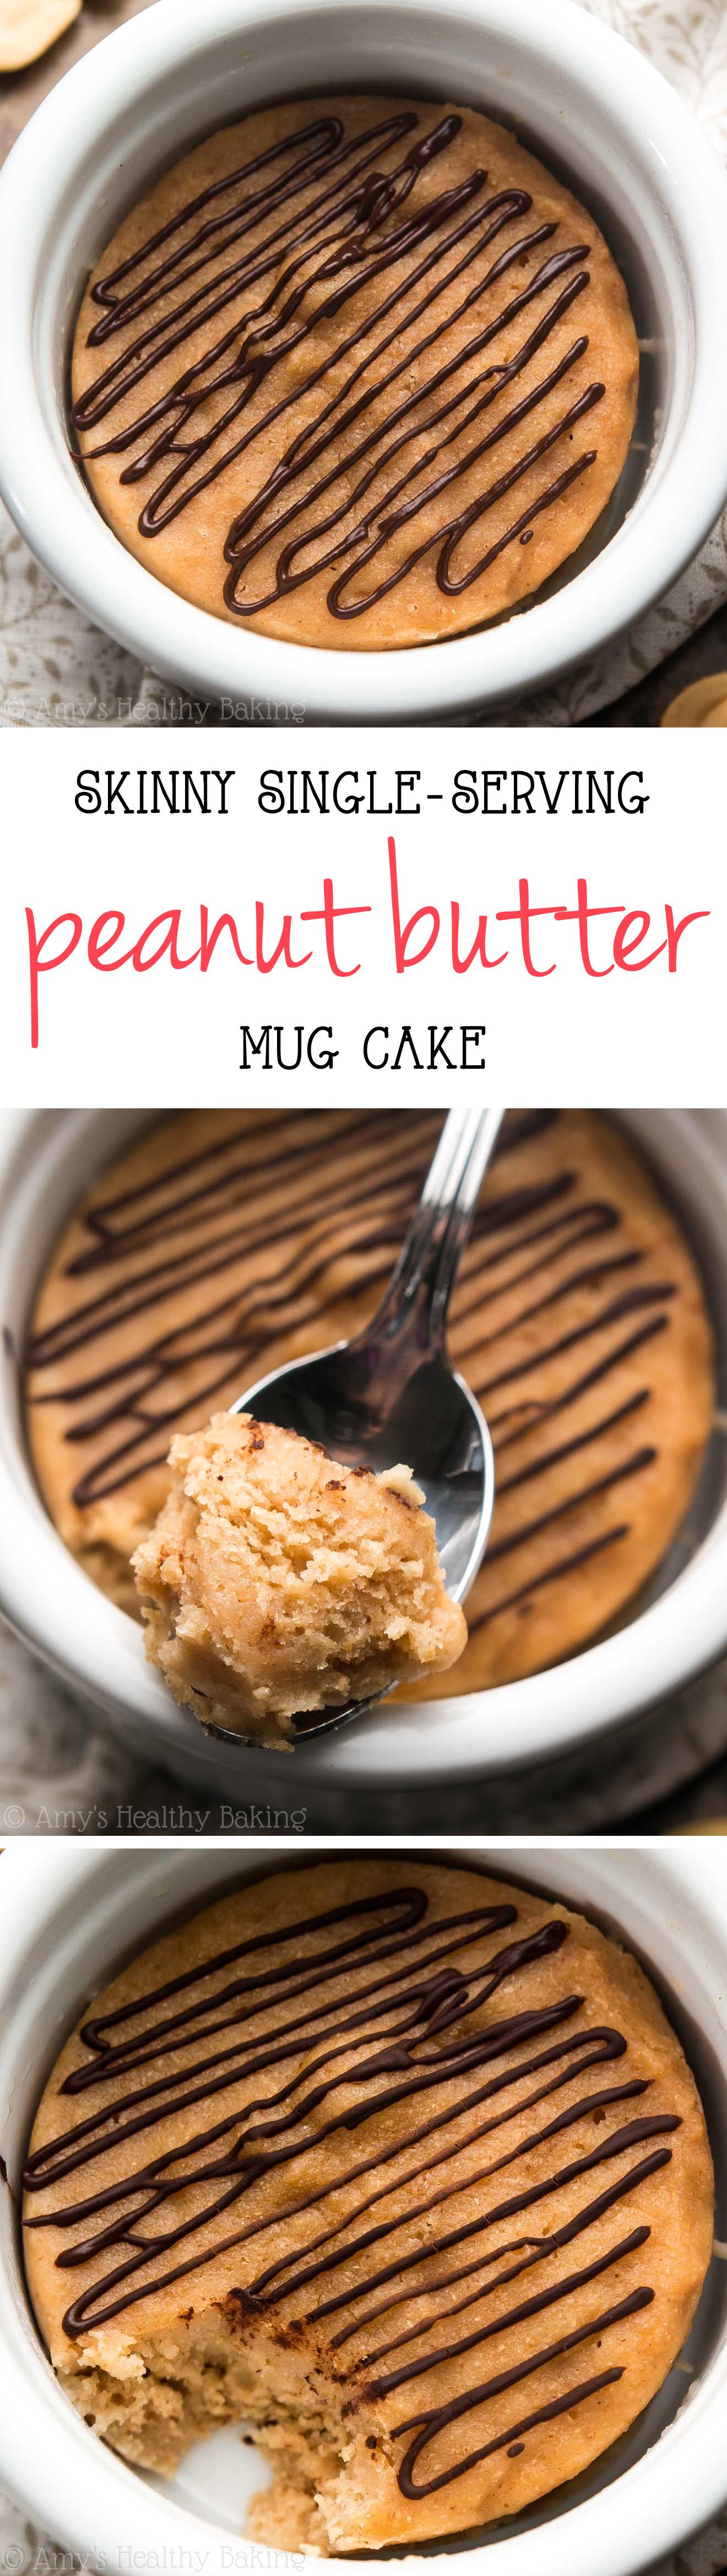 Skinny Peanut Butter Mug Cake   Amy's Healthy Baking